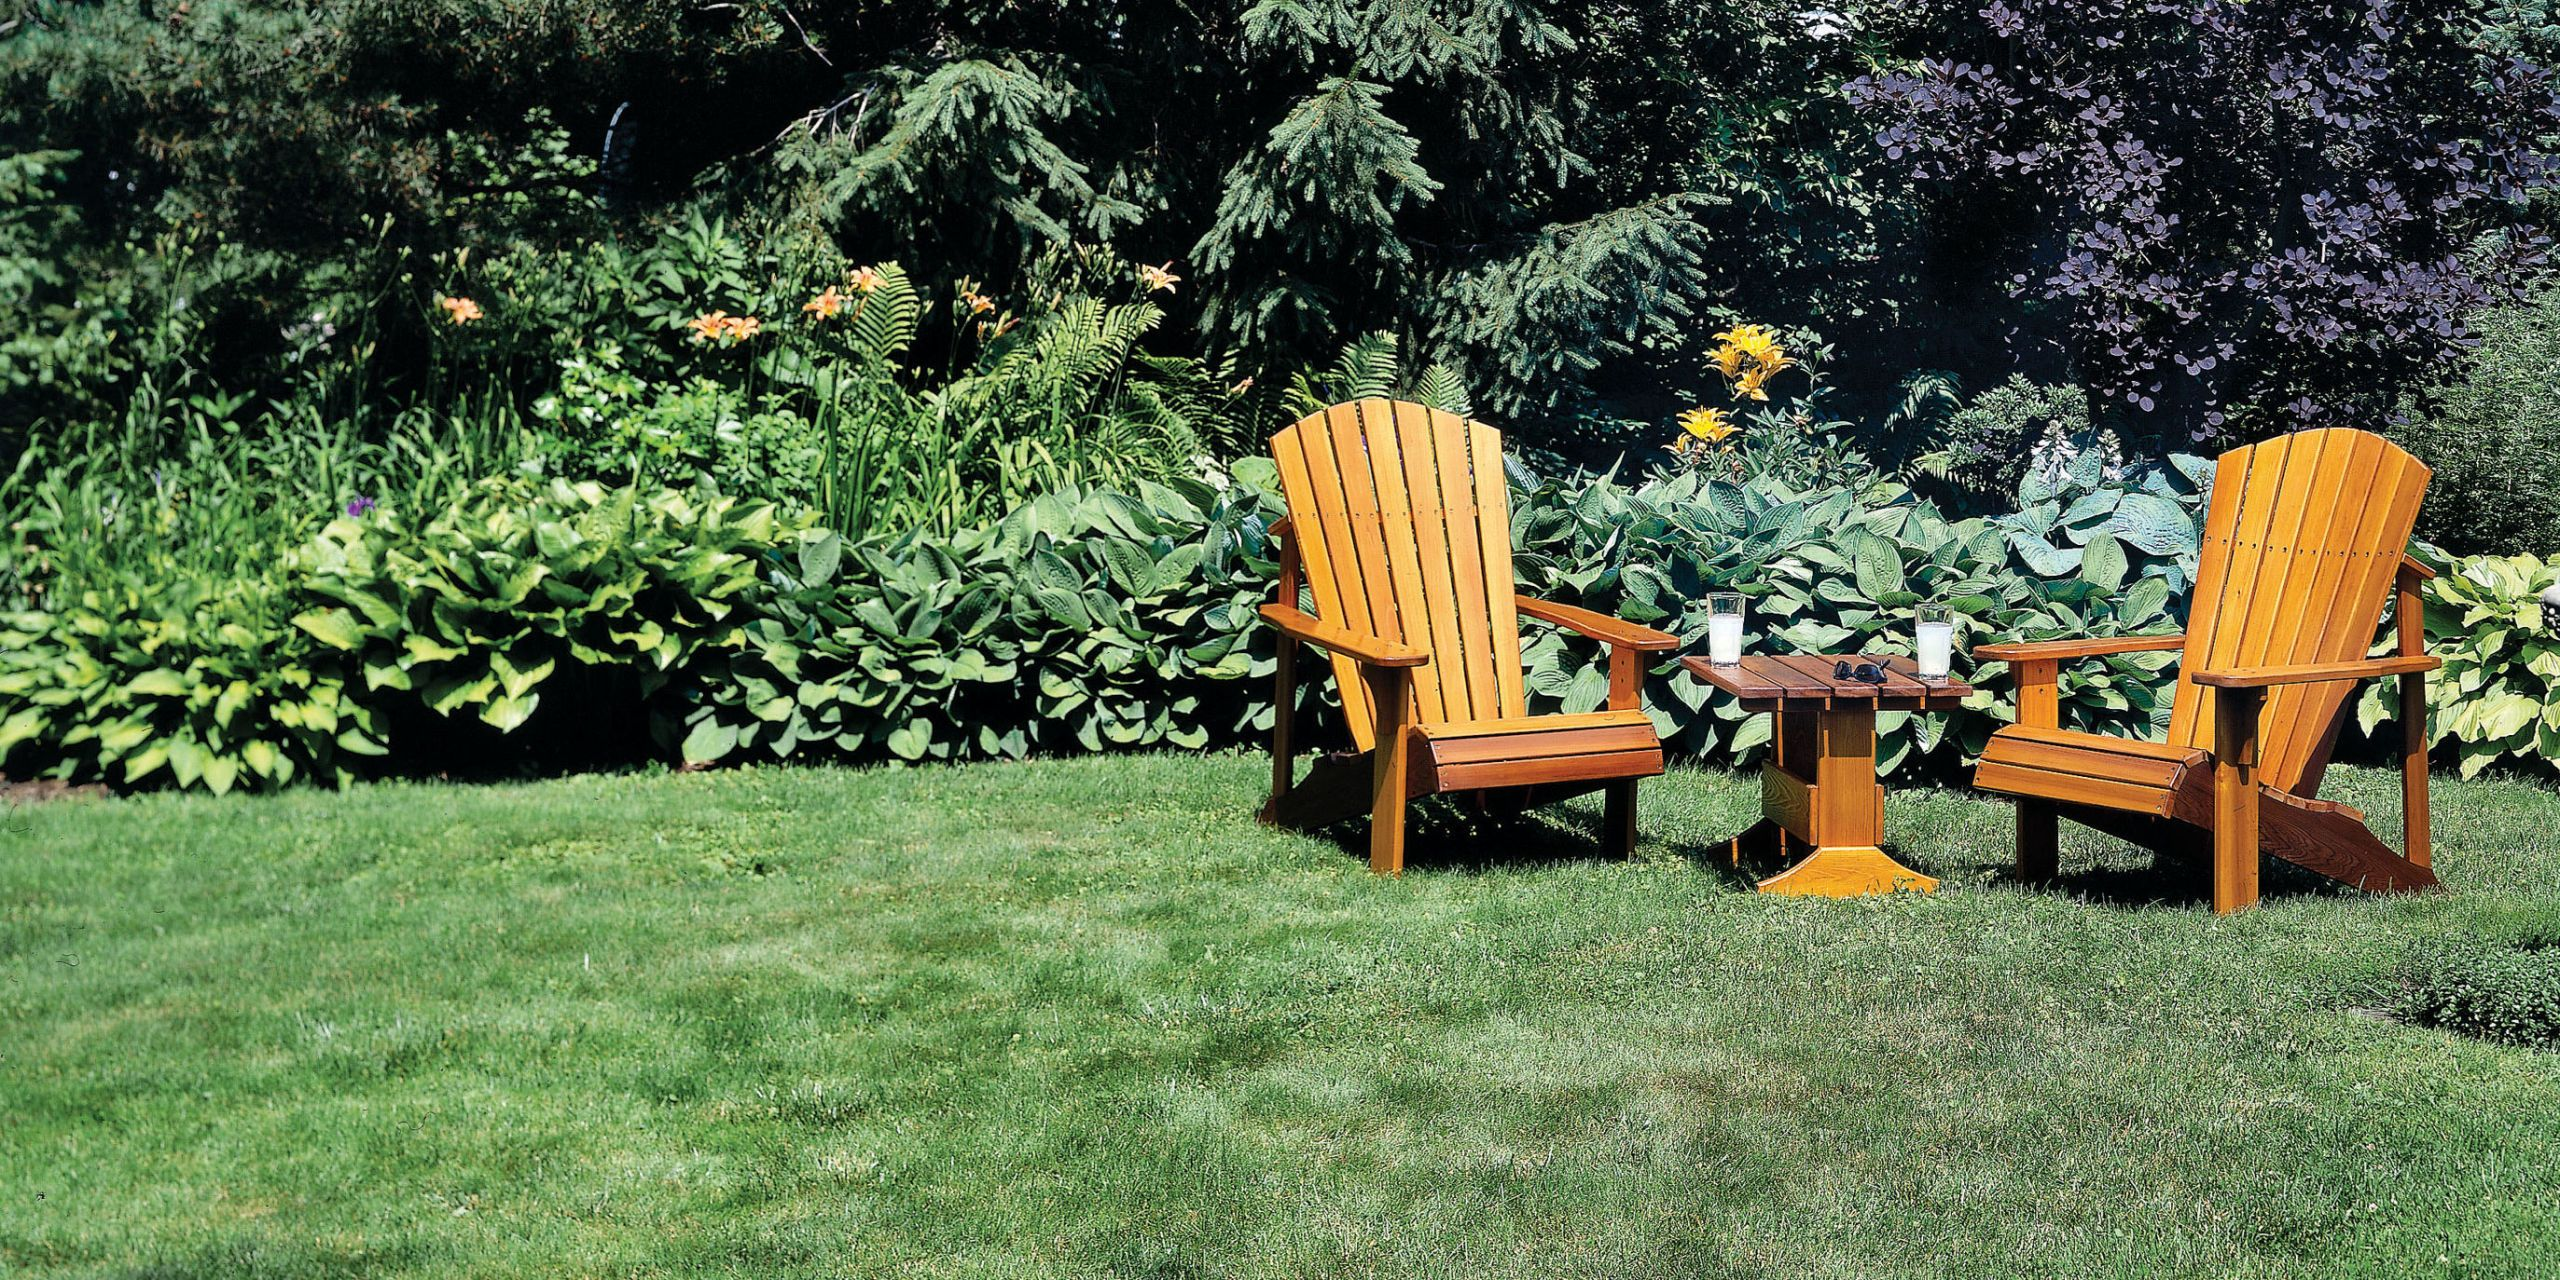 Easy Adirondack Chair Plans  How to Build Adirondack